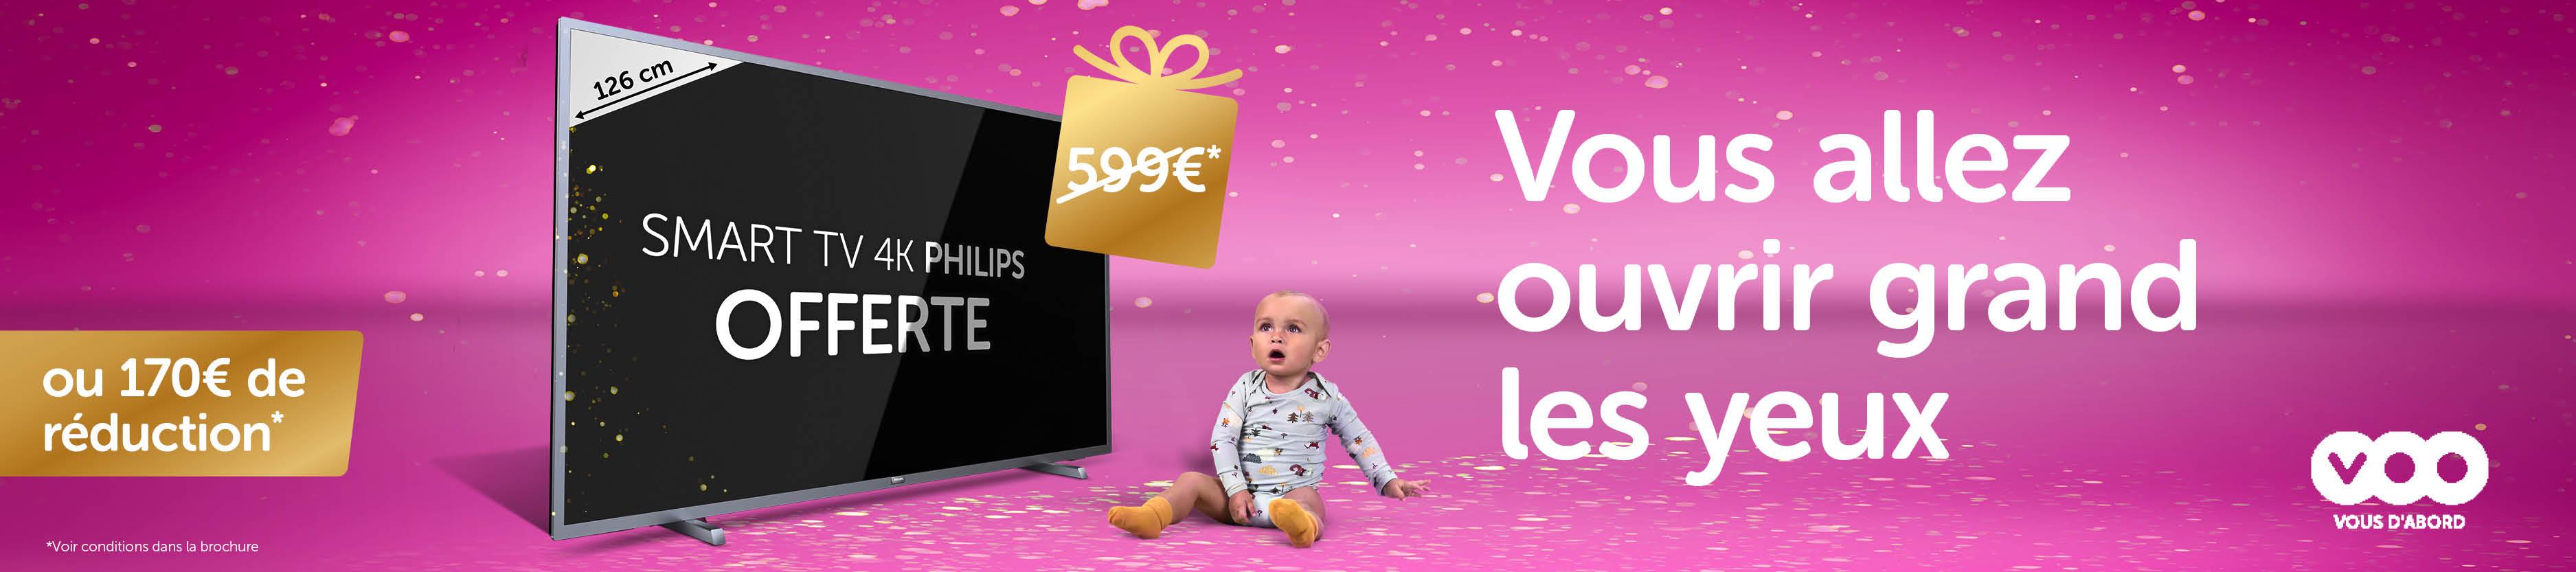 Promotion VOO TV Philips gratuite